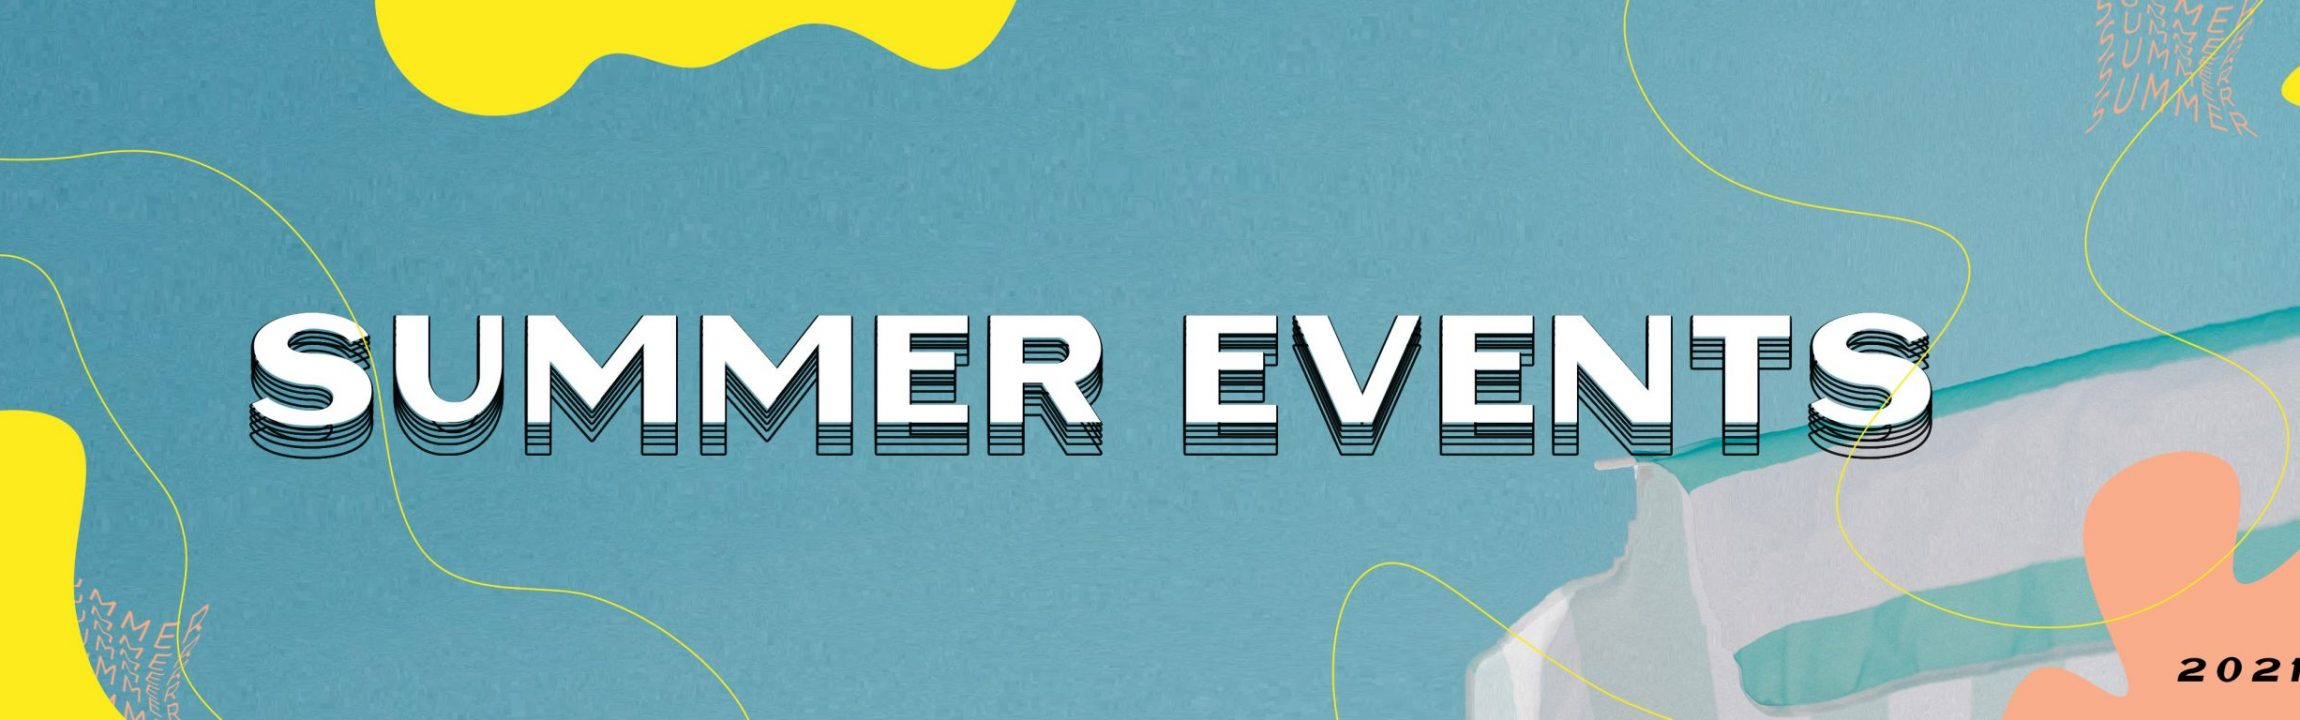 summer events website feature